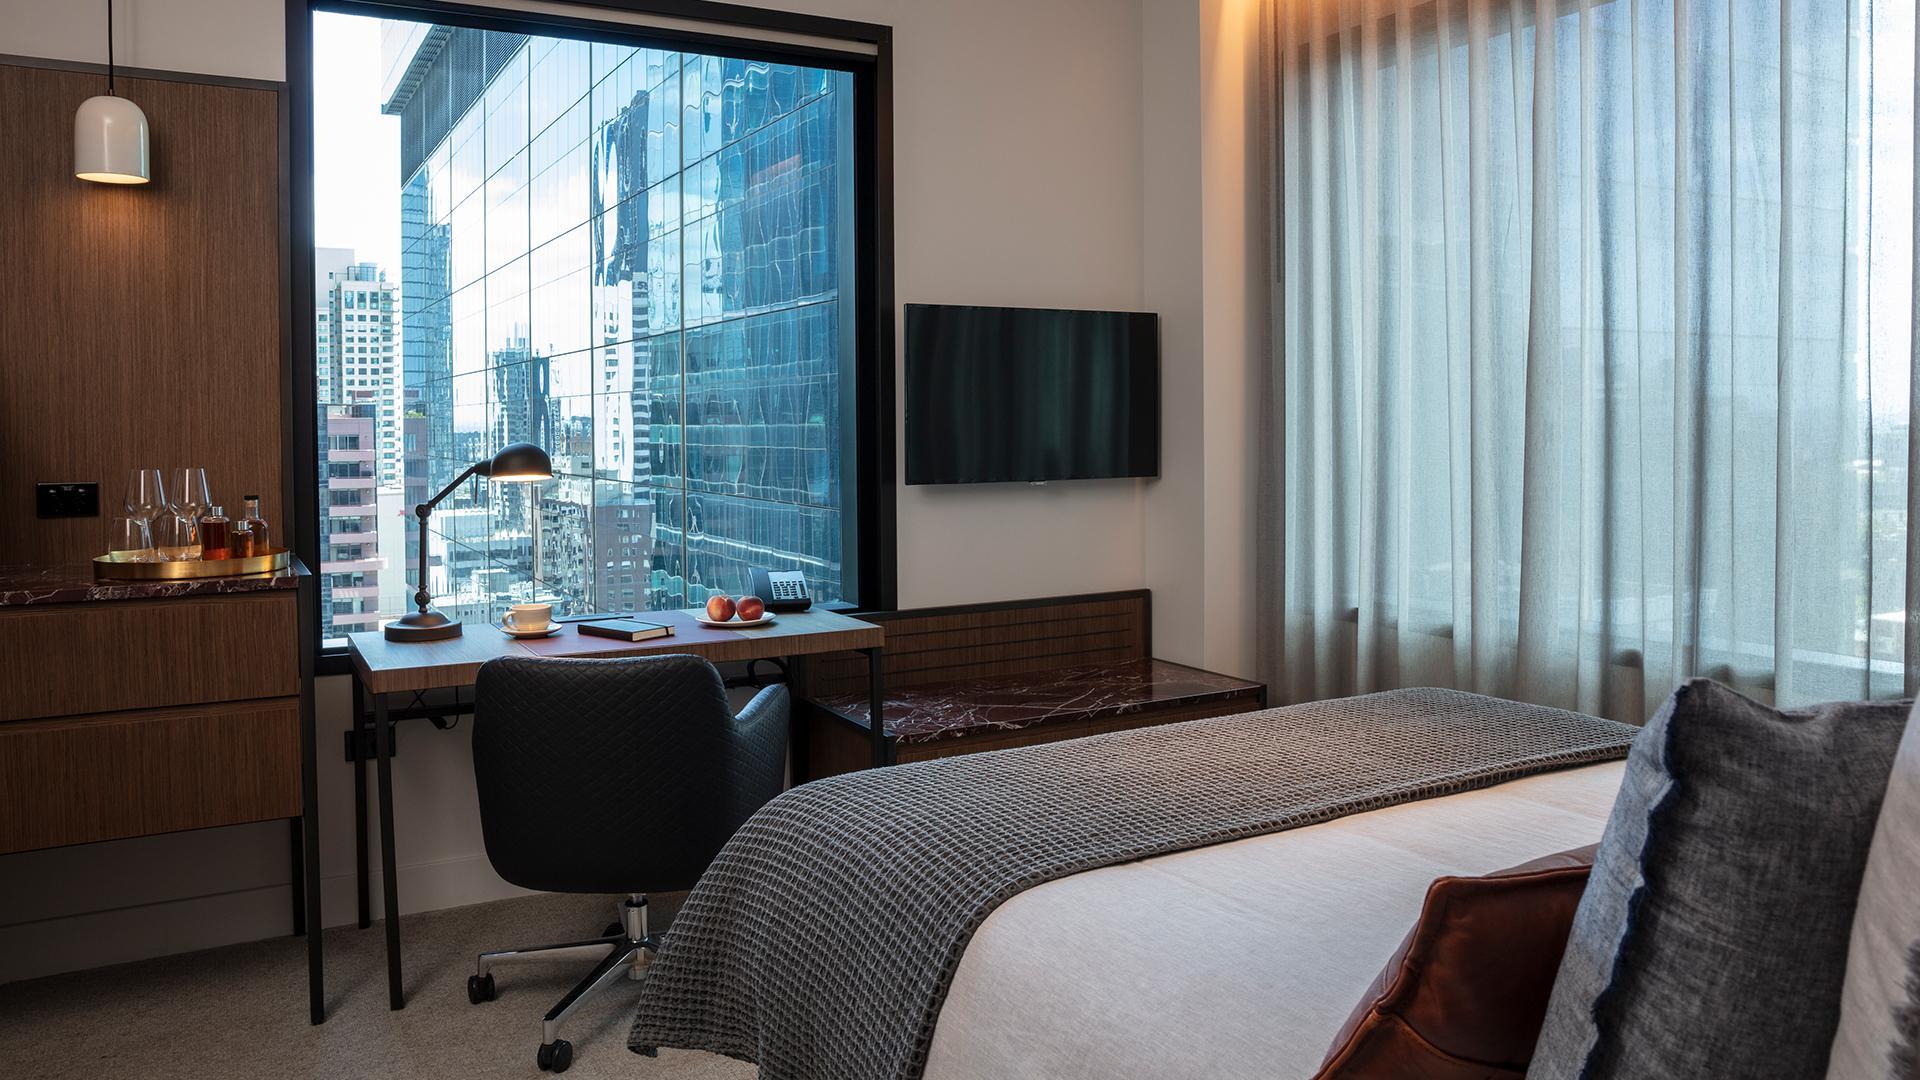 Next Queen Room image 1 at Next Hotel Melbourne by Melbourne City, Victoria, Australia